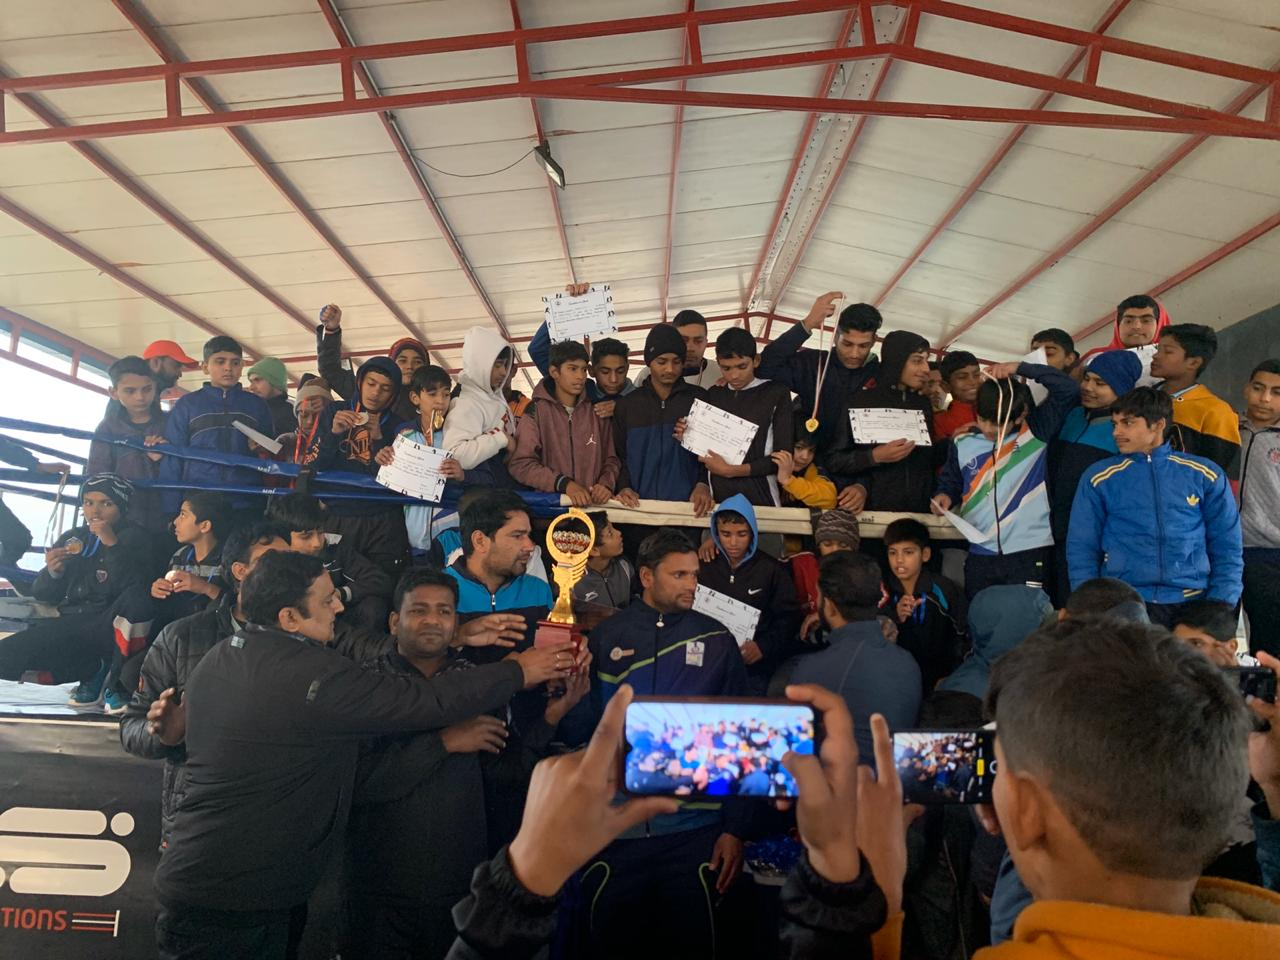 Gohana Boxing Team Has Won The Championship During NCR Open Boxing Championship organised by Rabindranath World School Gurgaon